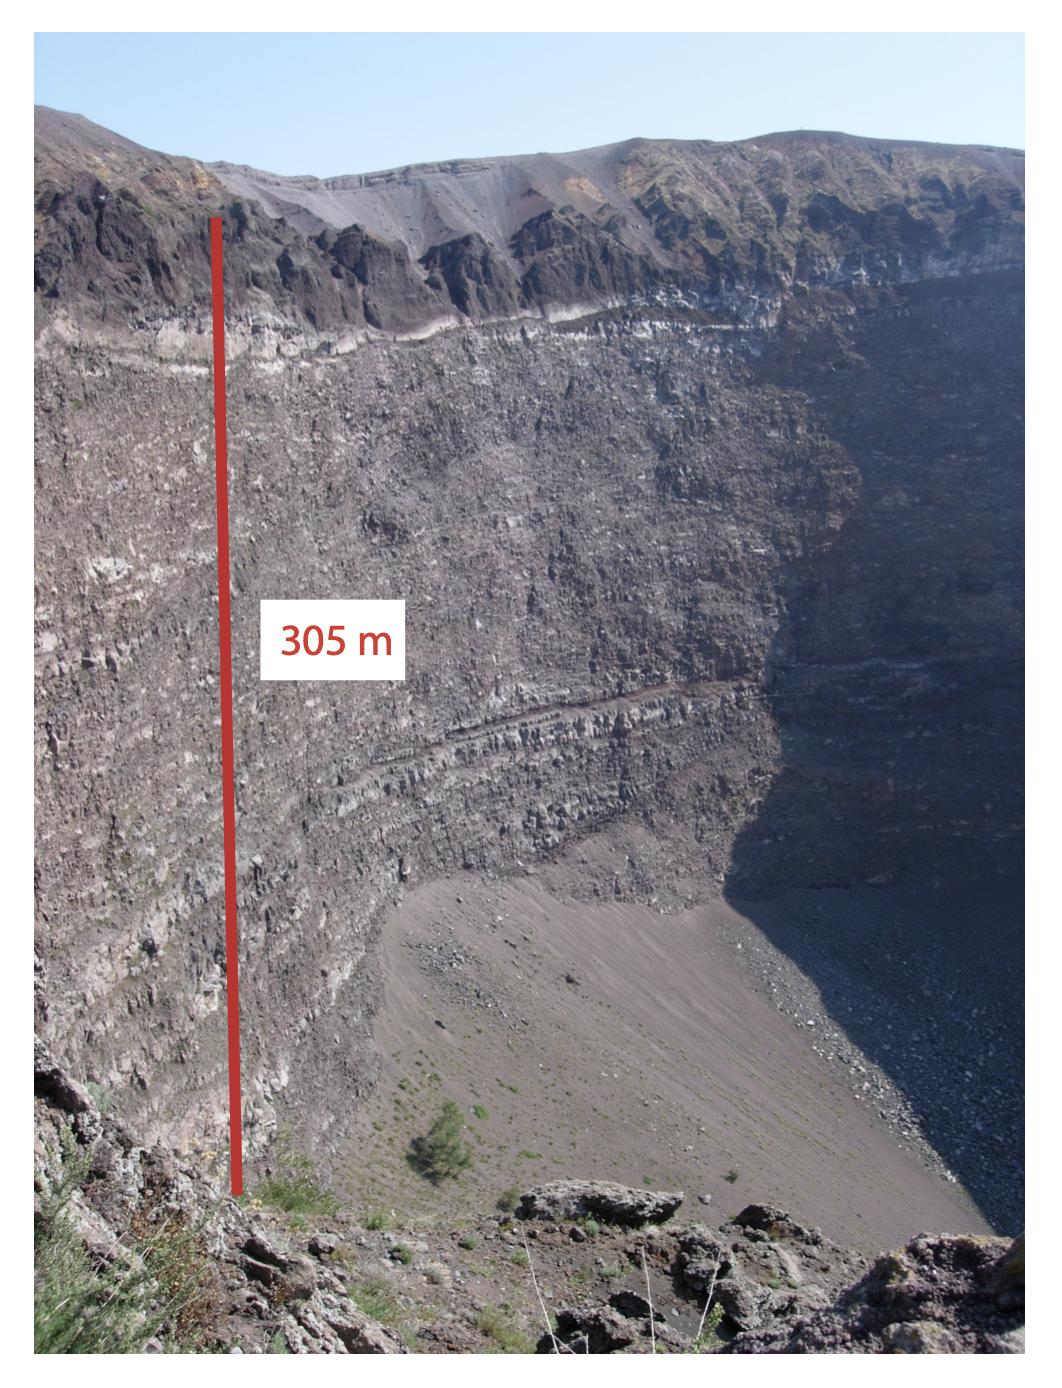 mtvesuvius_crater_wall.png